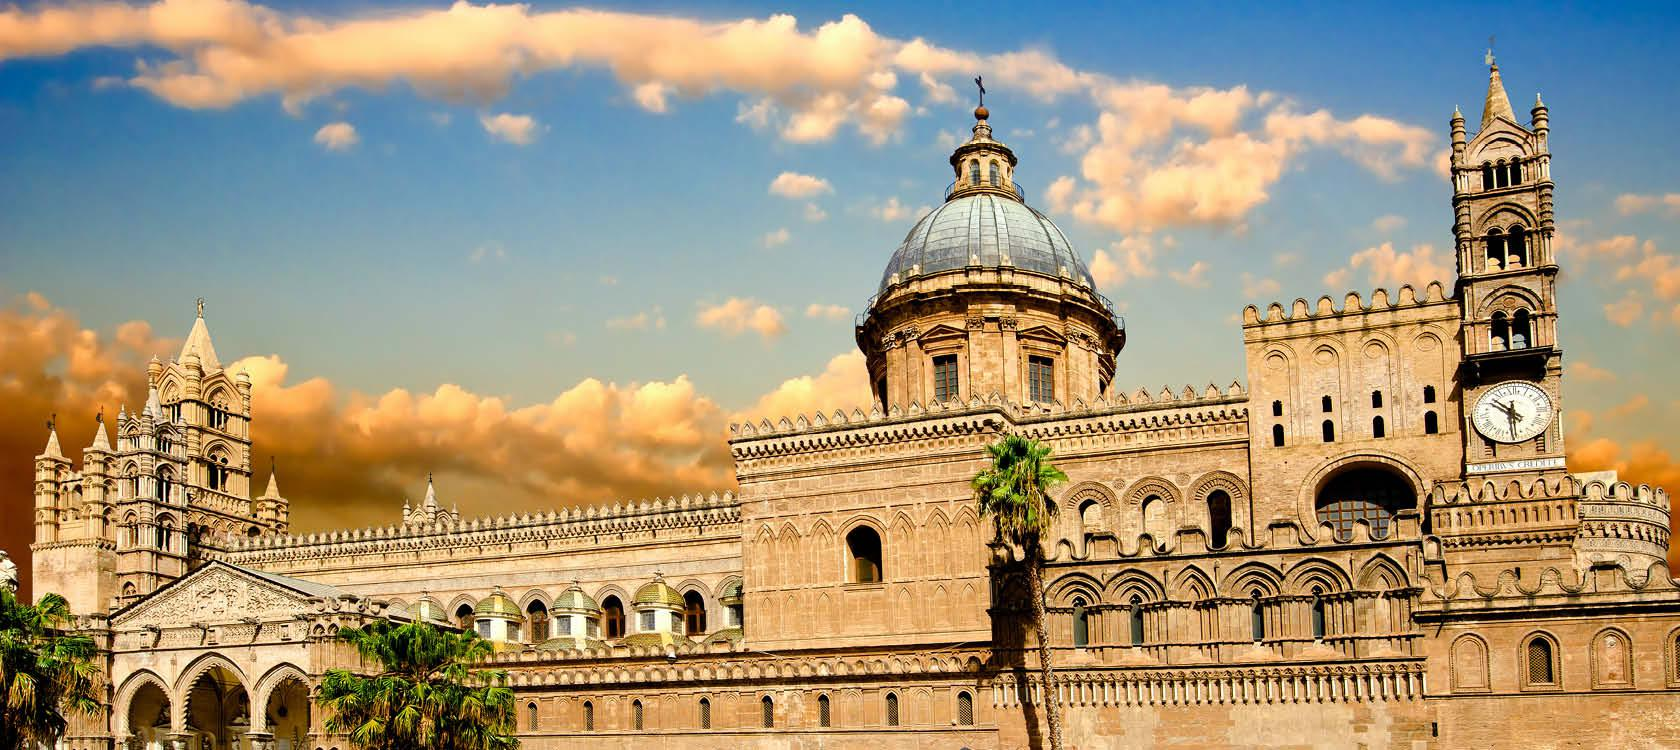 Katedralen i Palermo på Sicilien, Italien